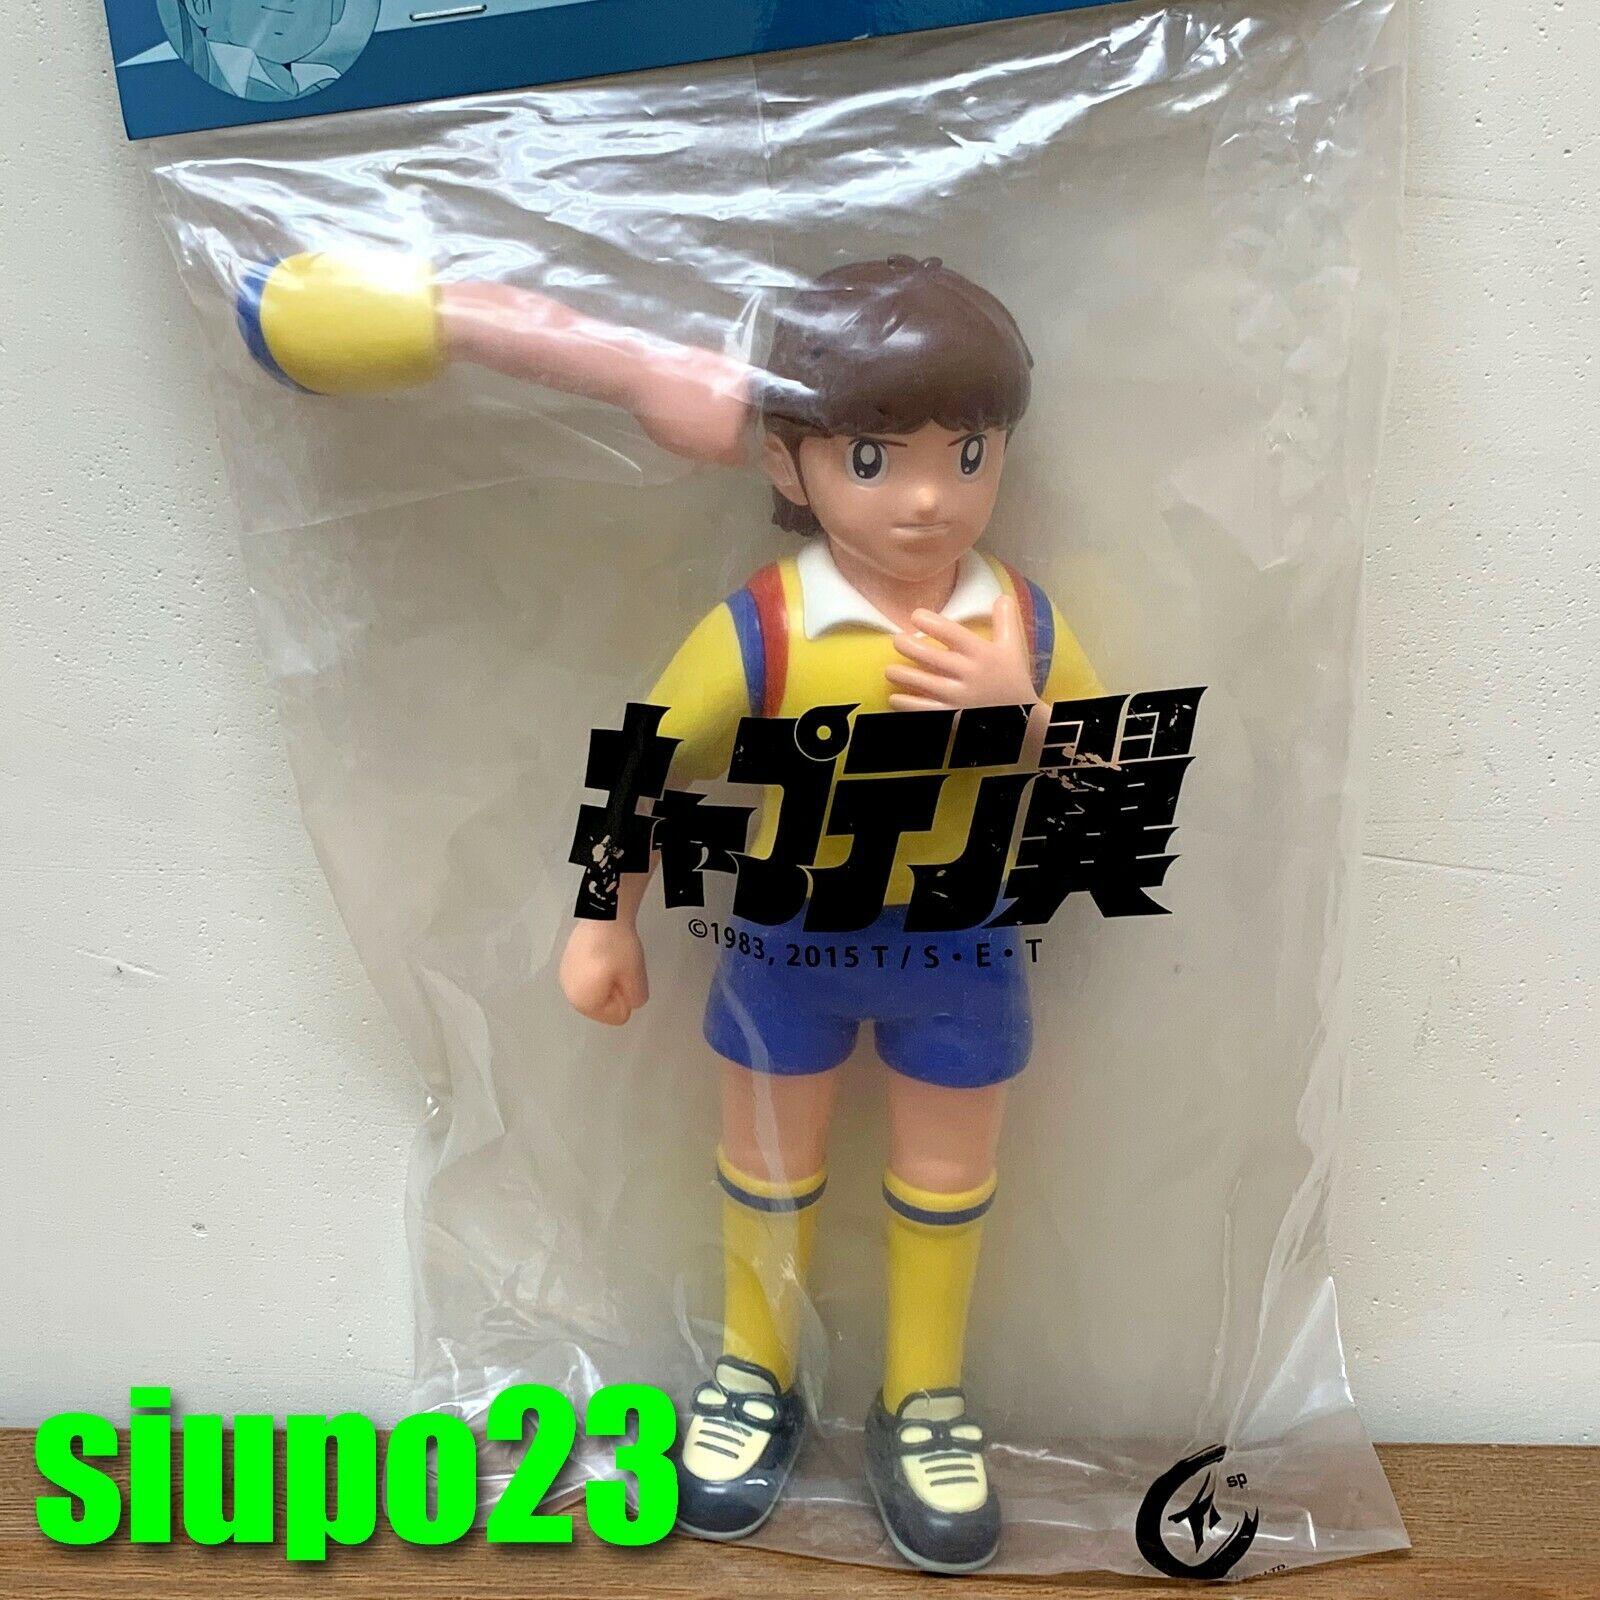 Kou Shou-do Captain Tsubasa  MISUGI Jun Vinyl Figure Special Version